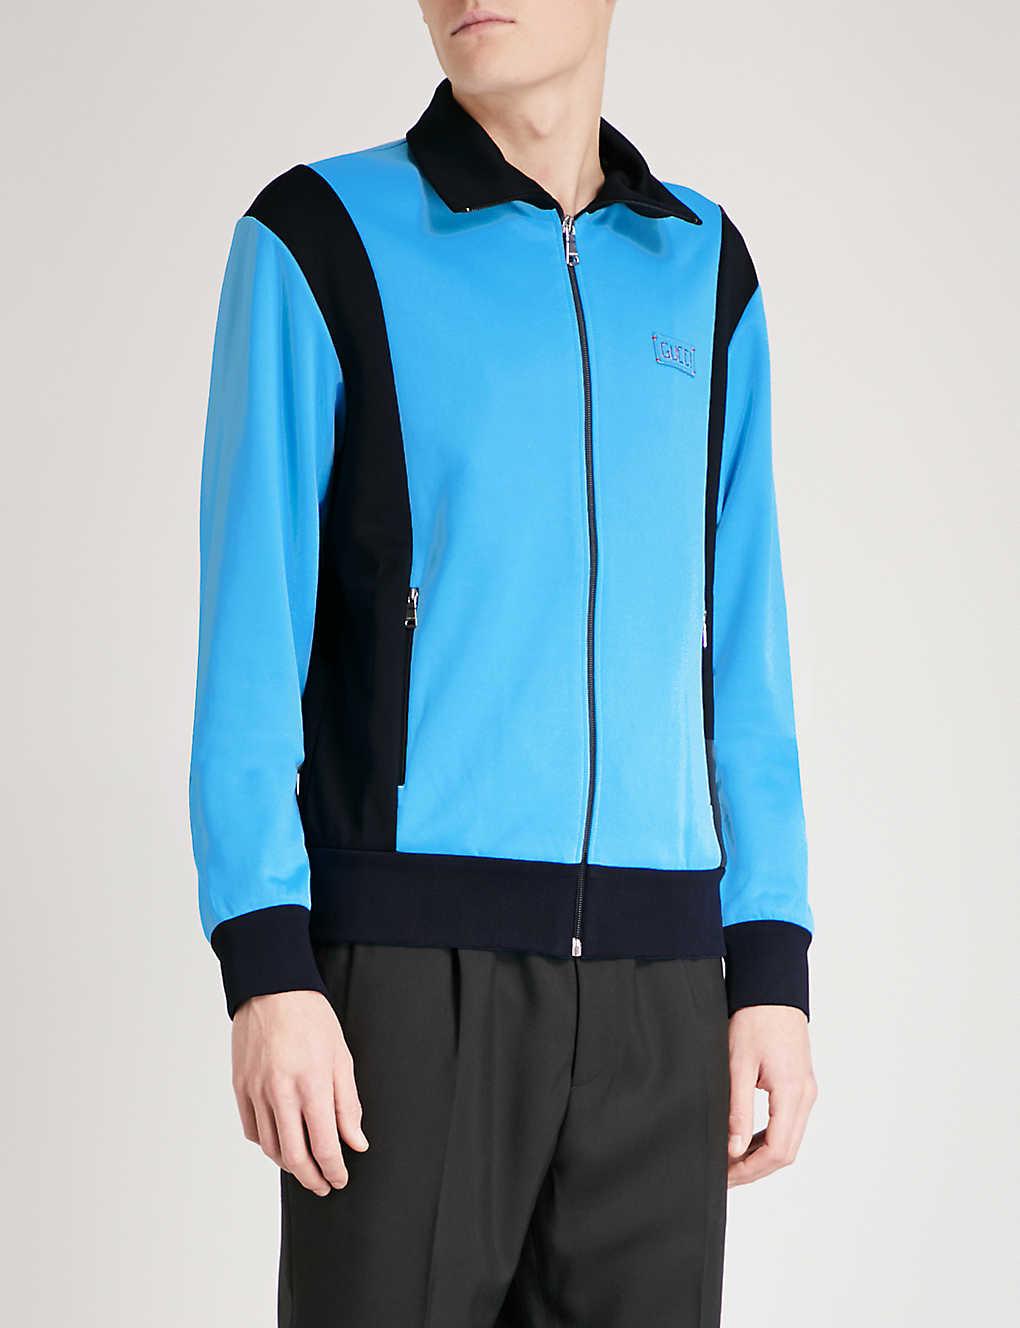 d96fe40e1 GUCCI - Tiger-embroidered jersey jacket | Selfridges.com